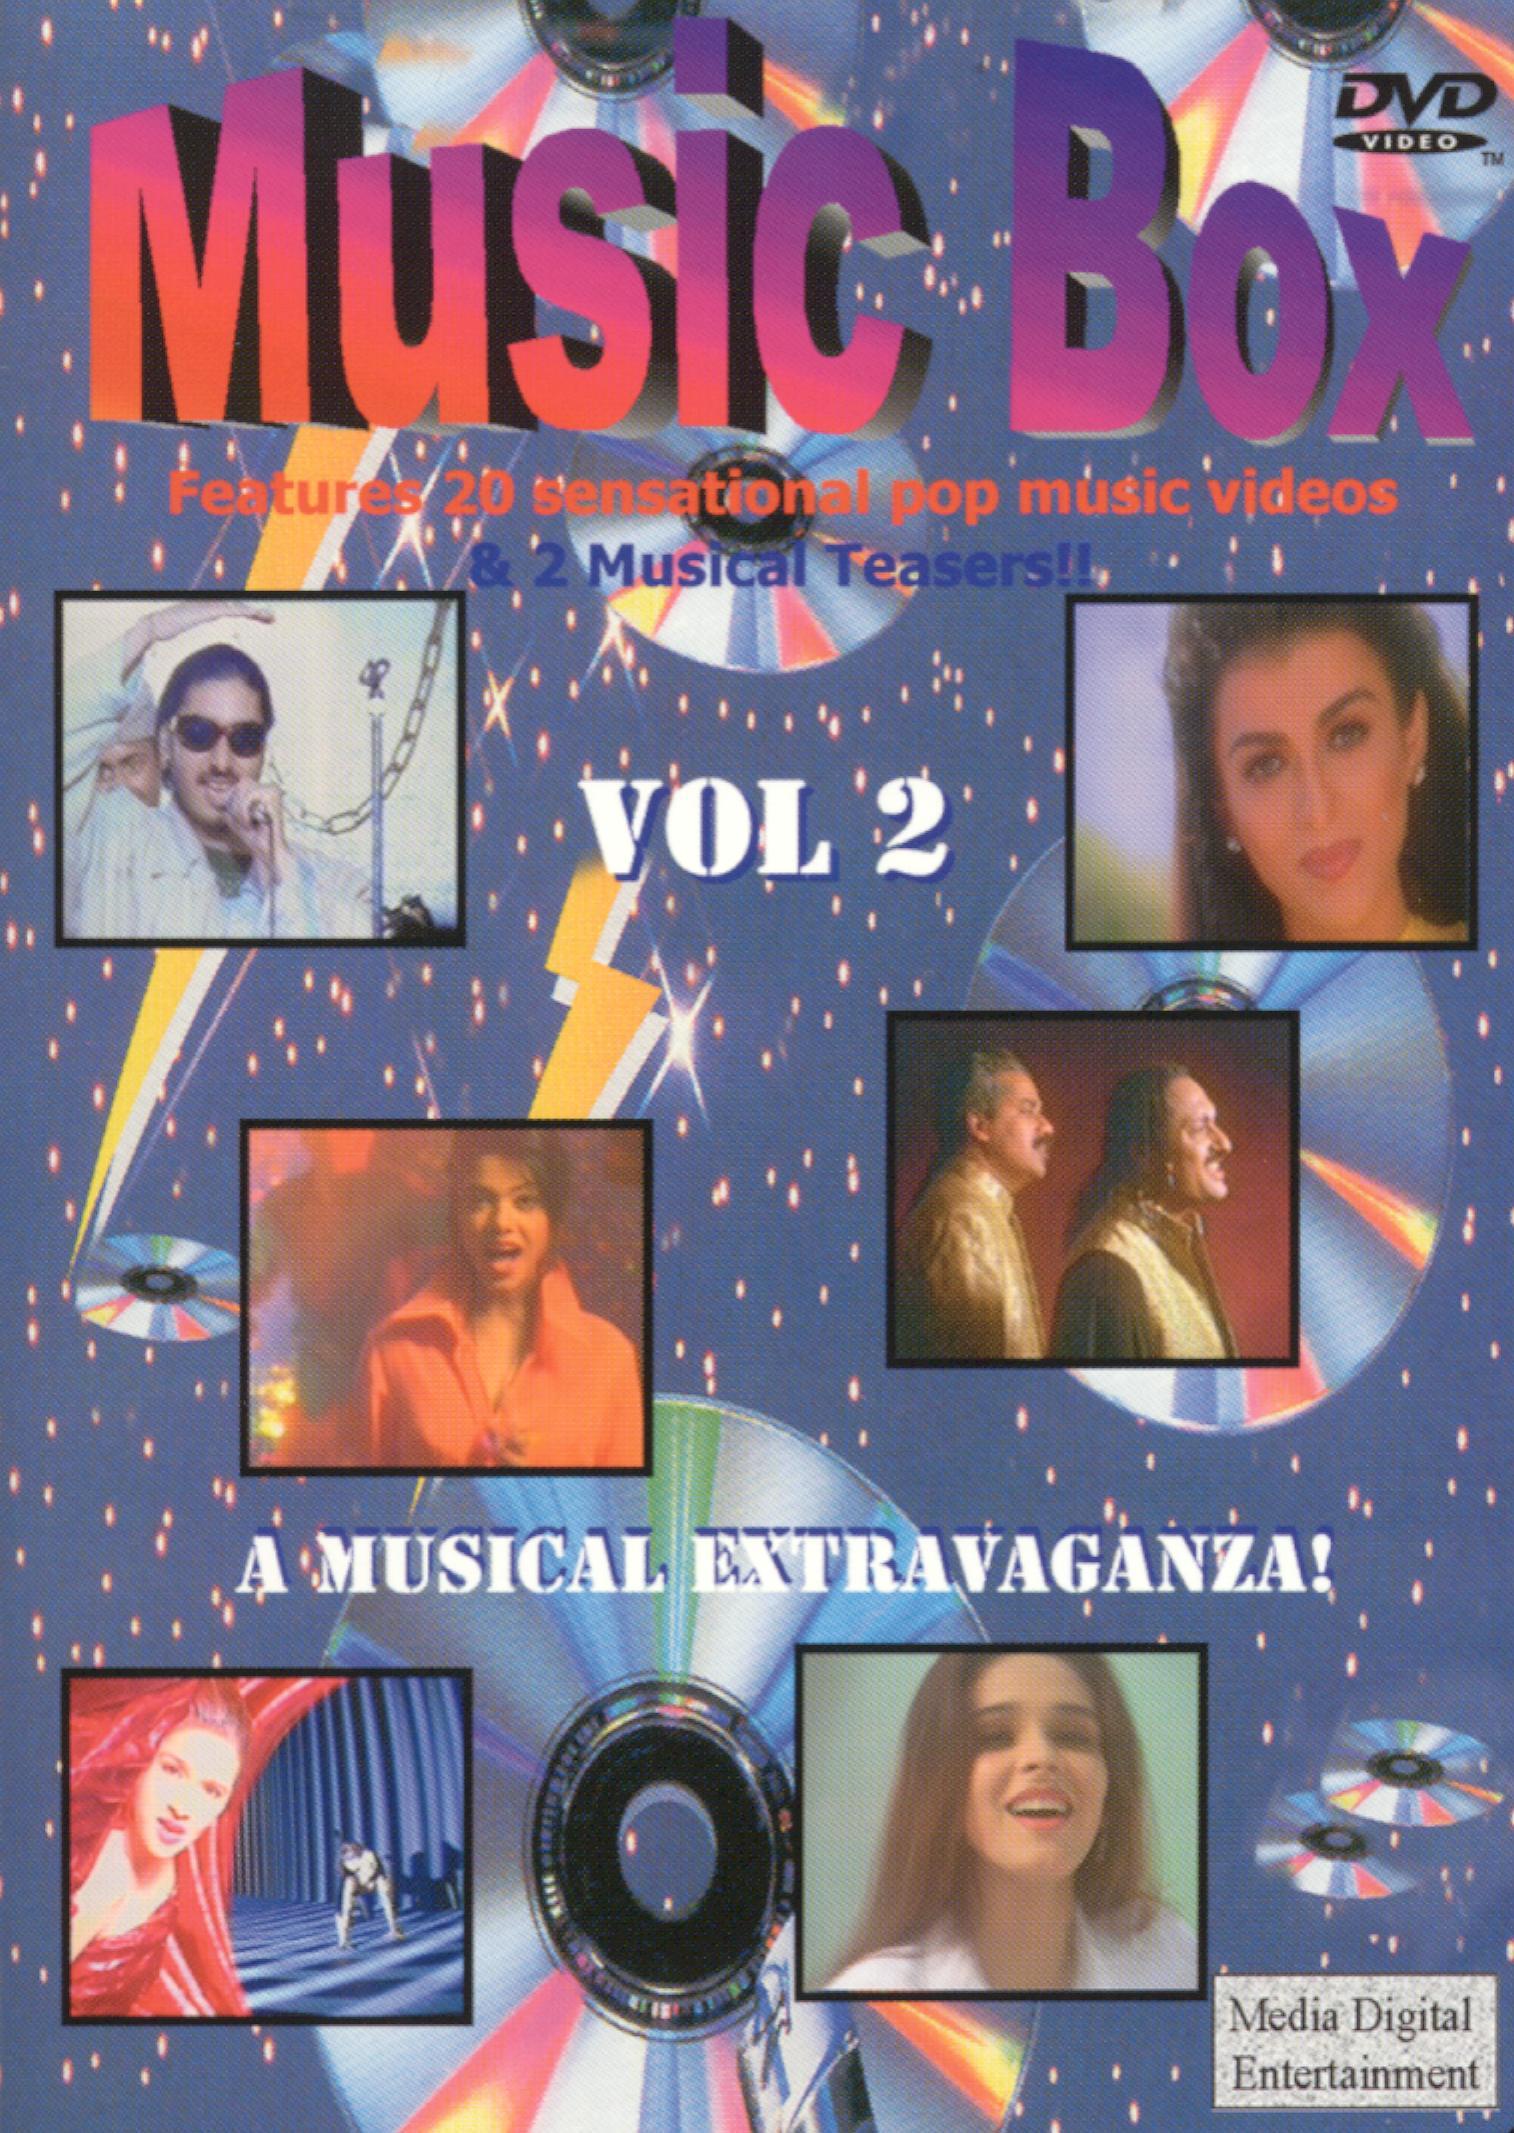 Music Box, Vol. 2